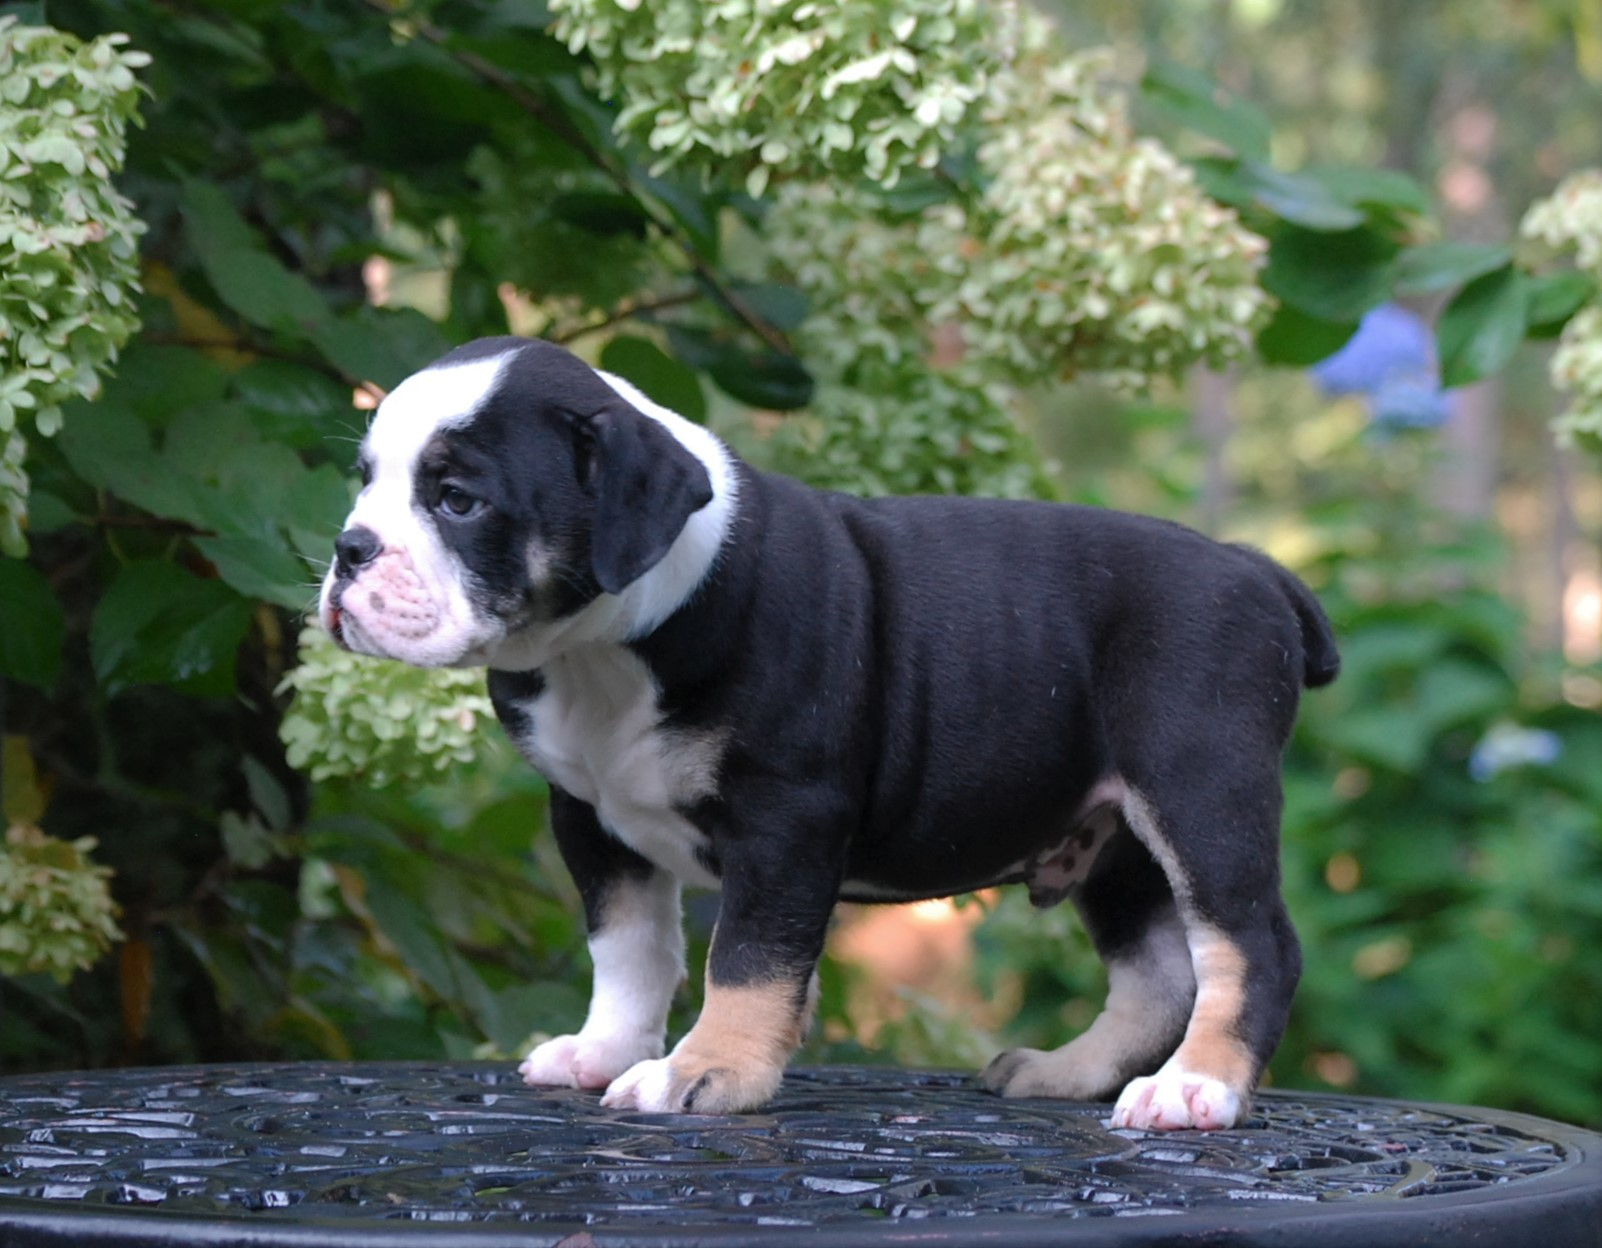 Crosby Olde English Bulldogge Puppy For Sale | Photo 1